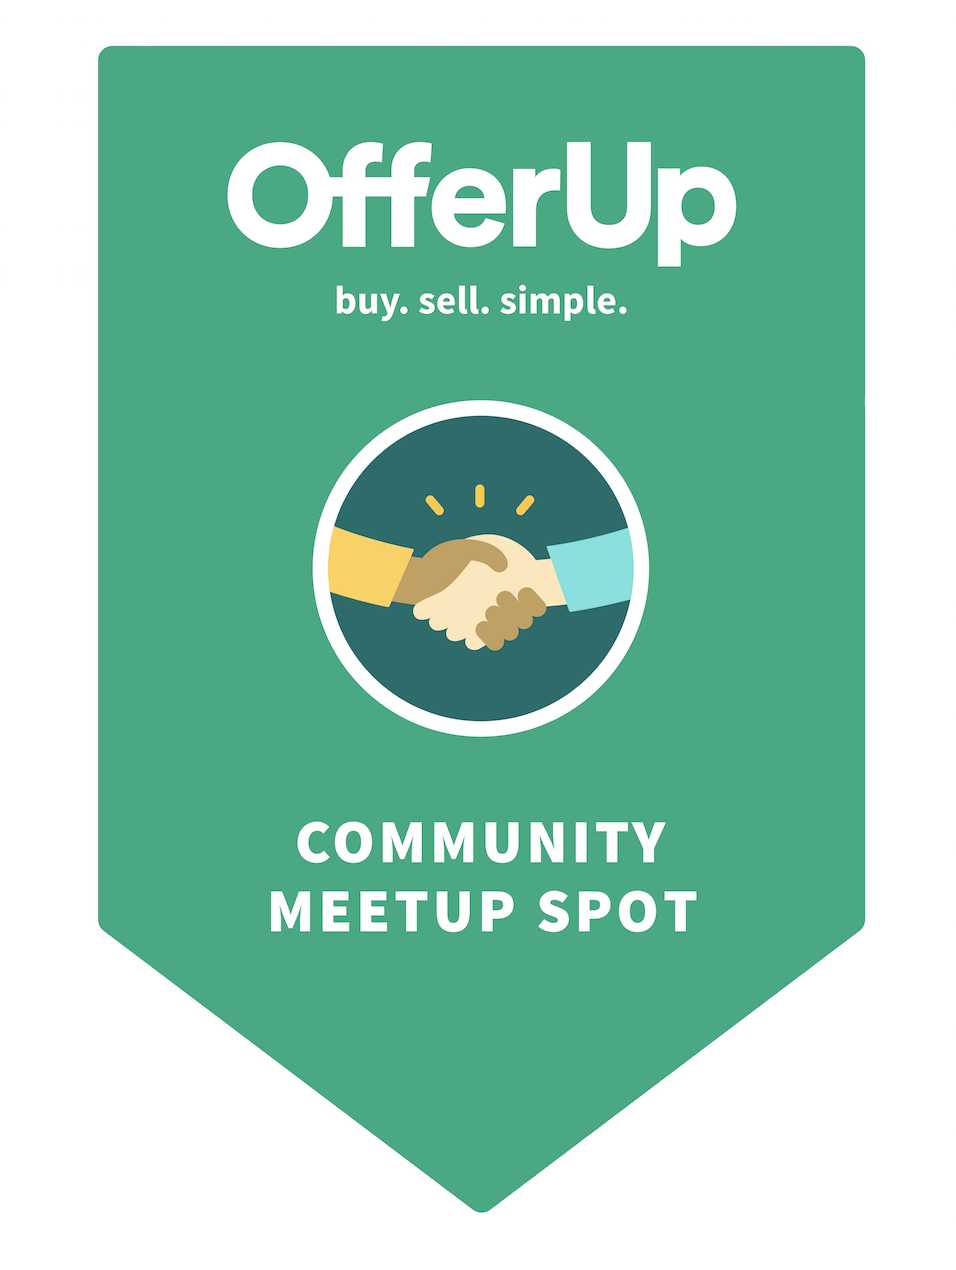 Find a Community MeetUp Spot on OfferUp